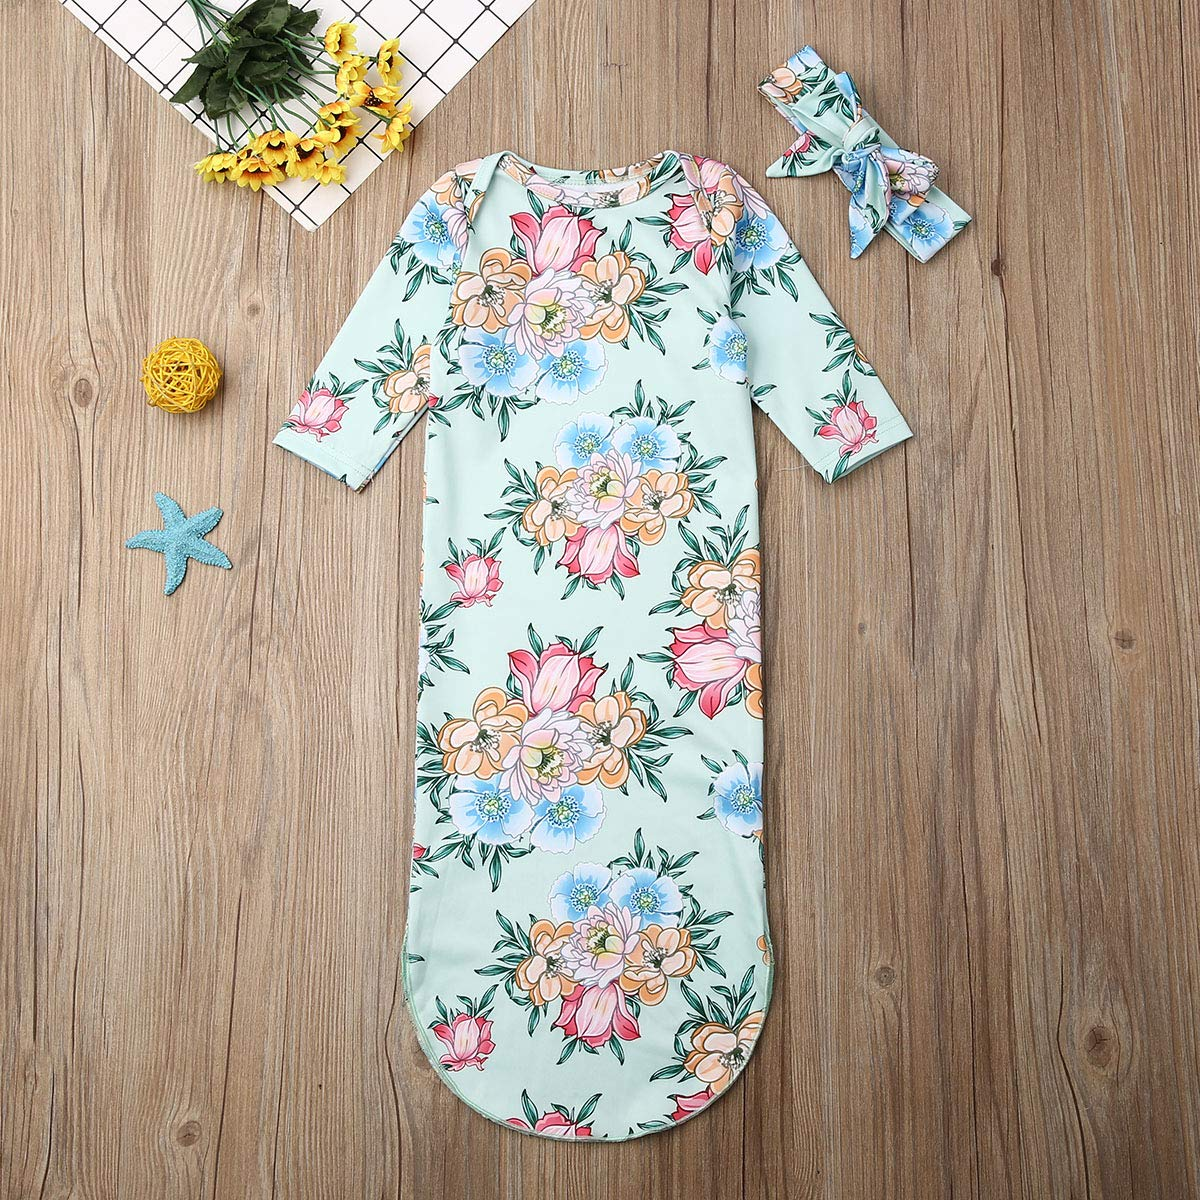 de algod/ón GWJGOGO Saco de dormir con nudos para beb/é reci/én nacido con vestido de noche y diadema de flores dise/ño floral unisex